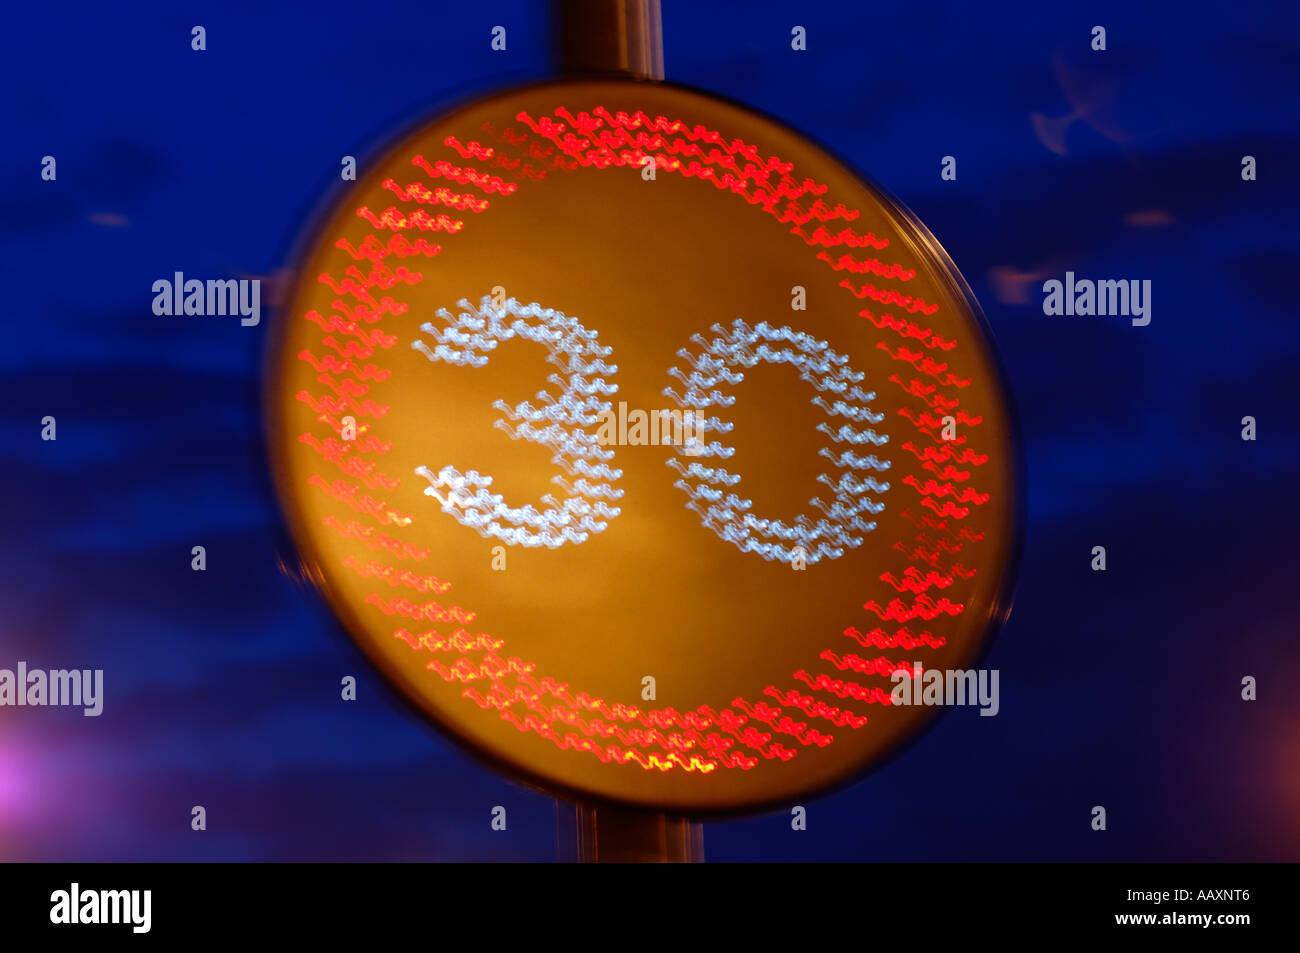 30 speed limit enforcement sign - Stock Image